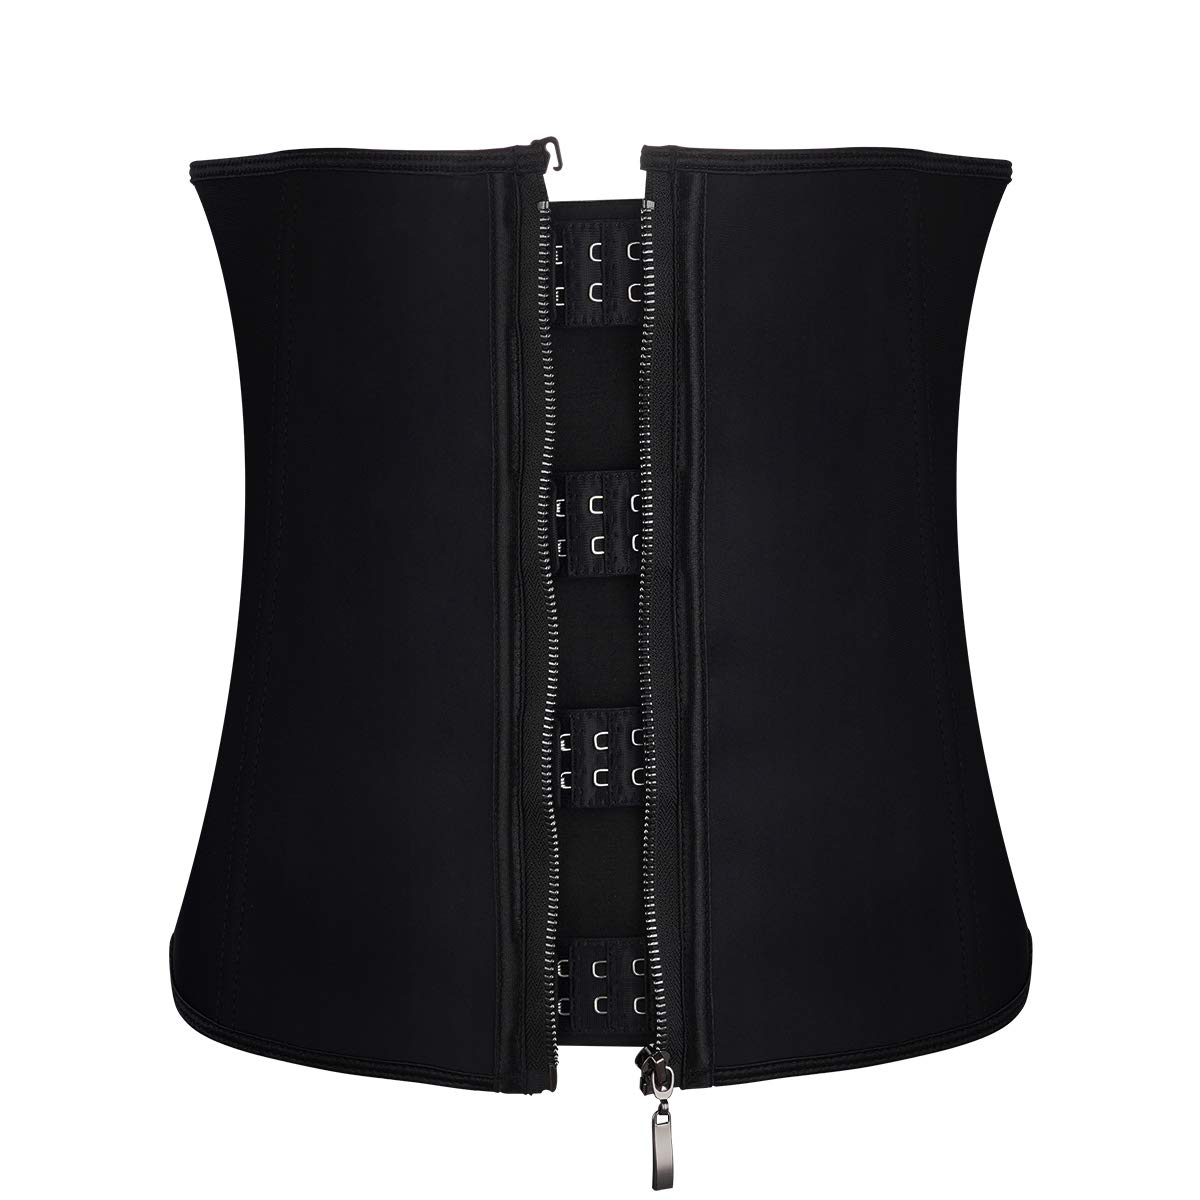 SUMEIYAN Womens Steel Boned Waist Trainer Belt with Zipper and Hooks for Weight Loss XS - 6XL(Black, 4XL)